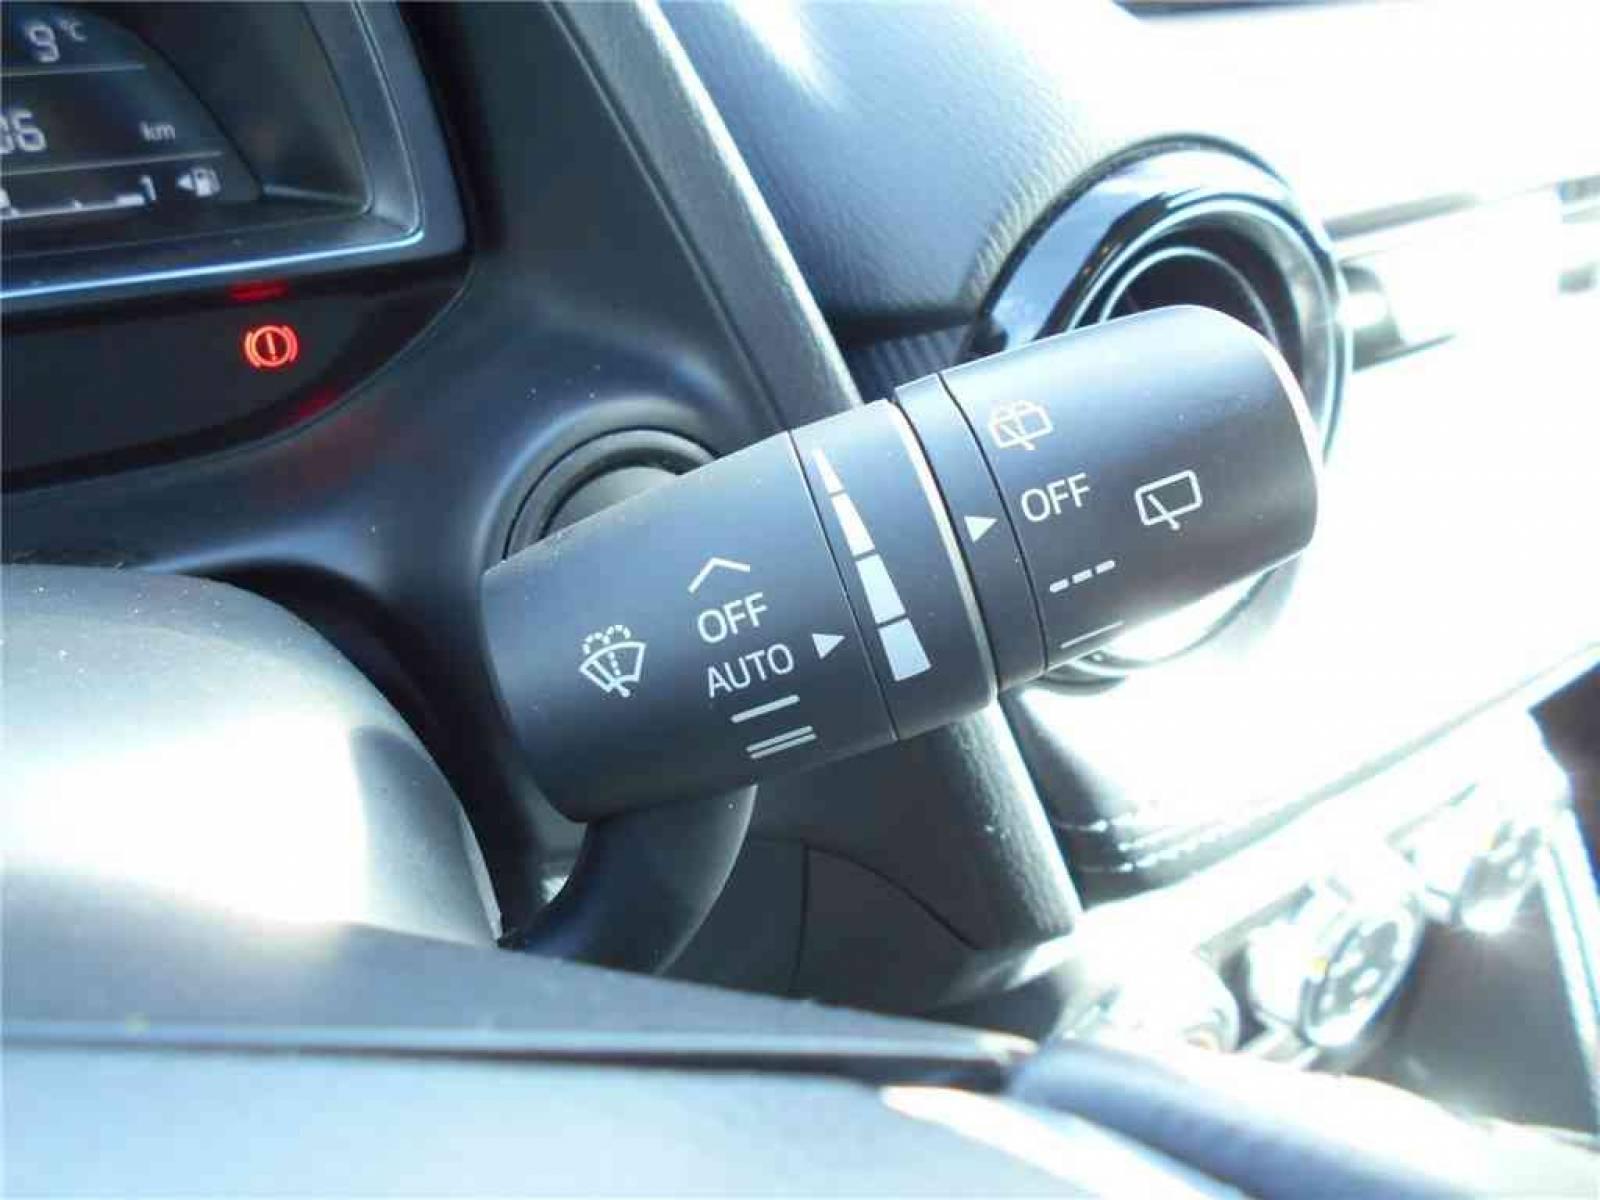 MAZDA Mazda2 1.5L SKYACTIV-G 115ch - véhicule d'occasion - Groupe Guillet - Chalon Automobiles - 71100 - Chalon-sur-Saône - 22